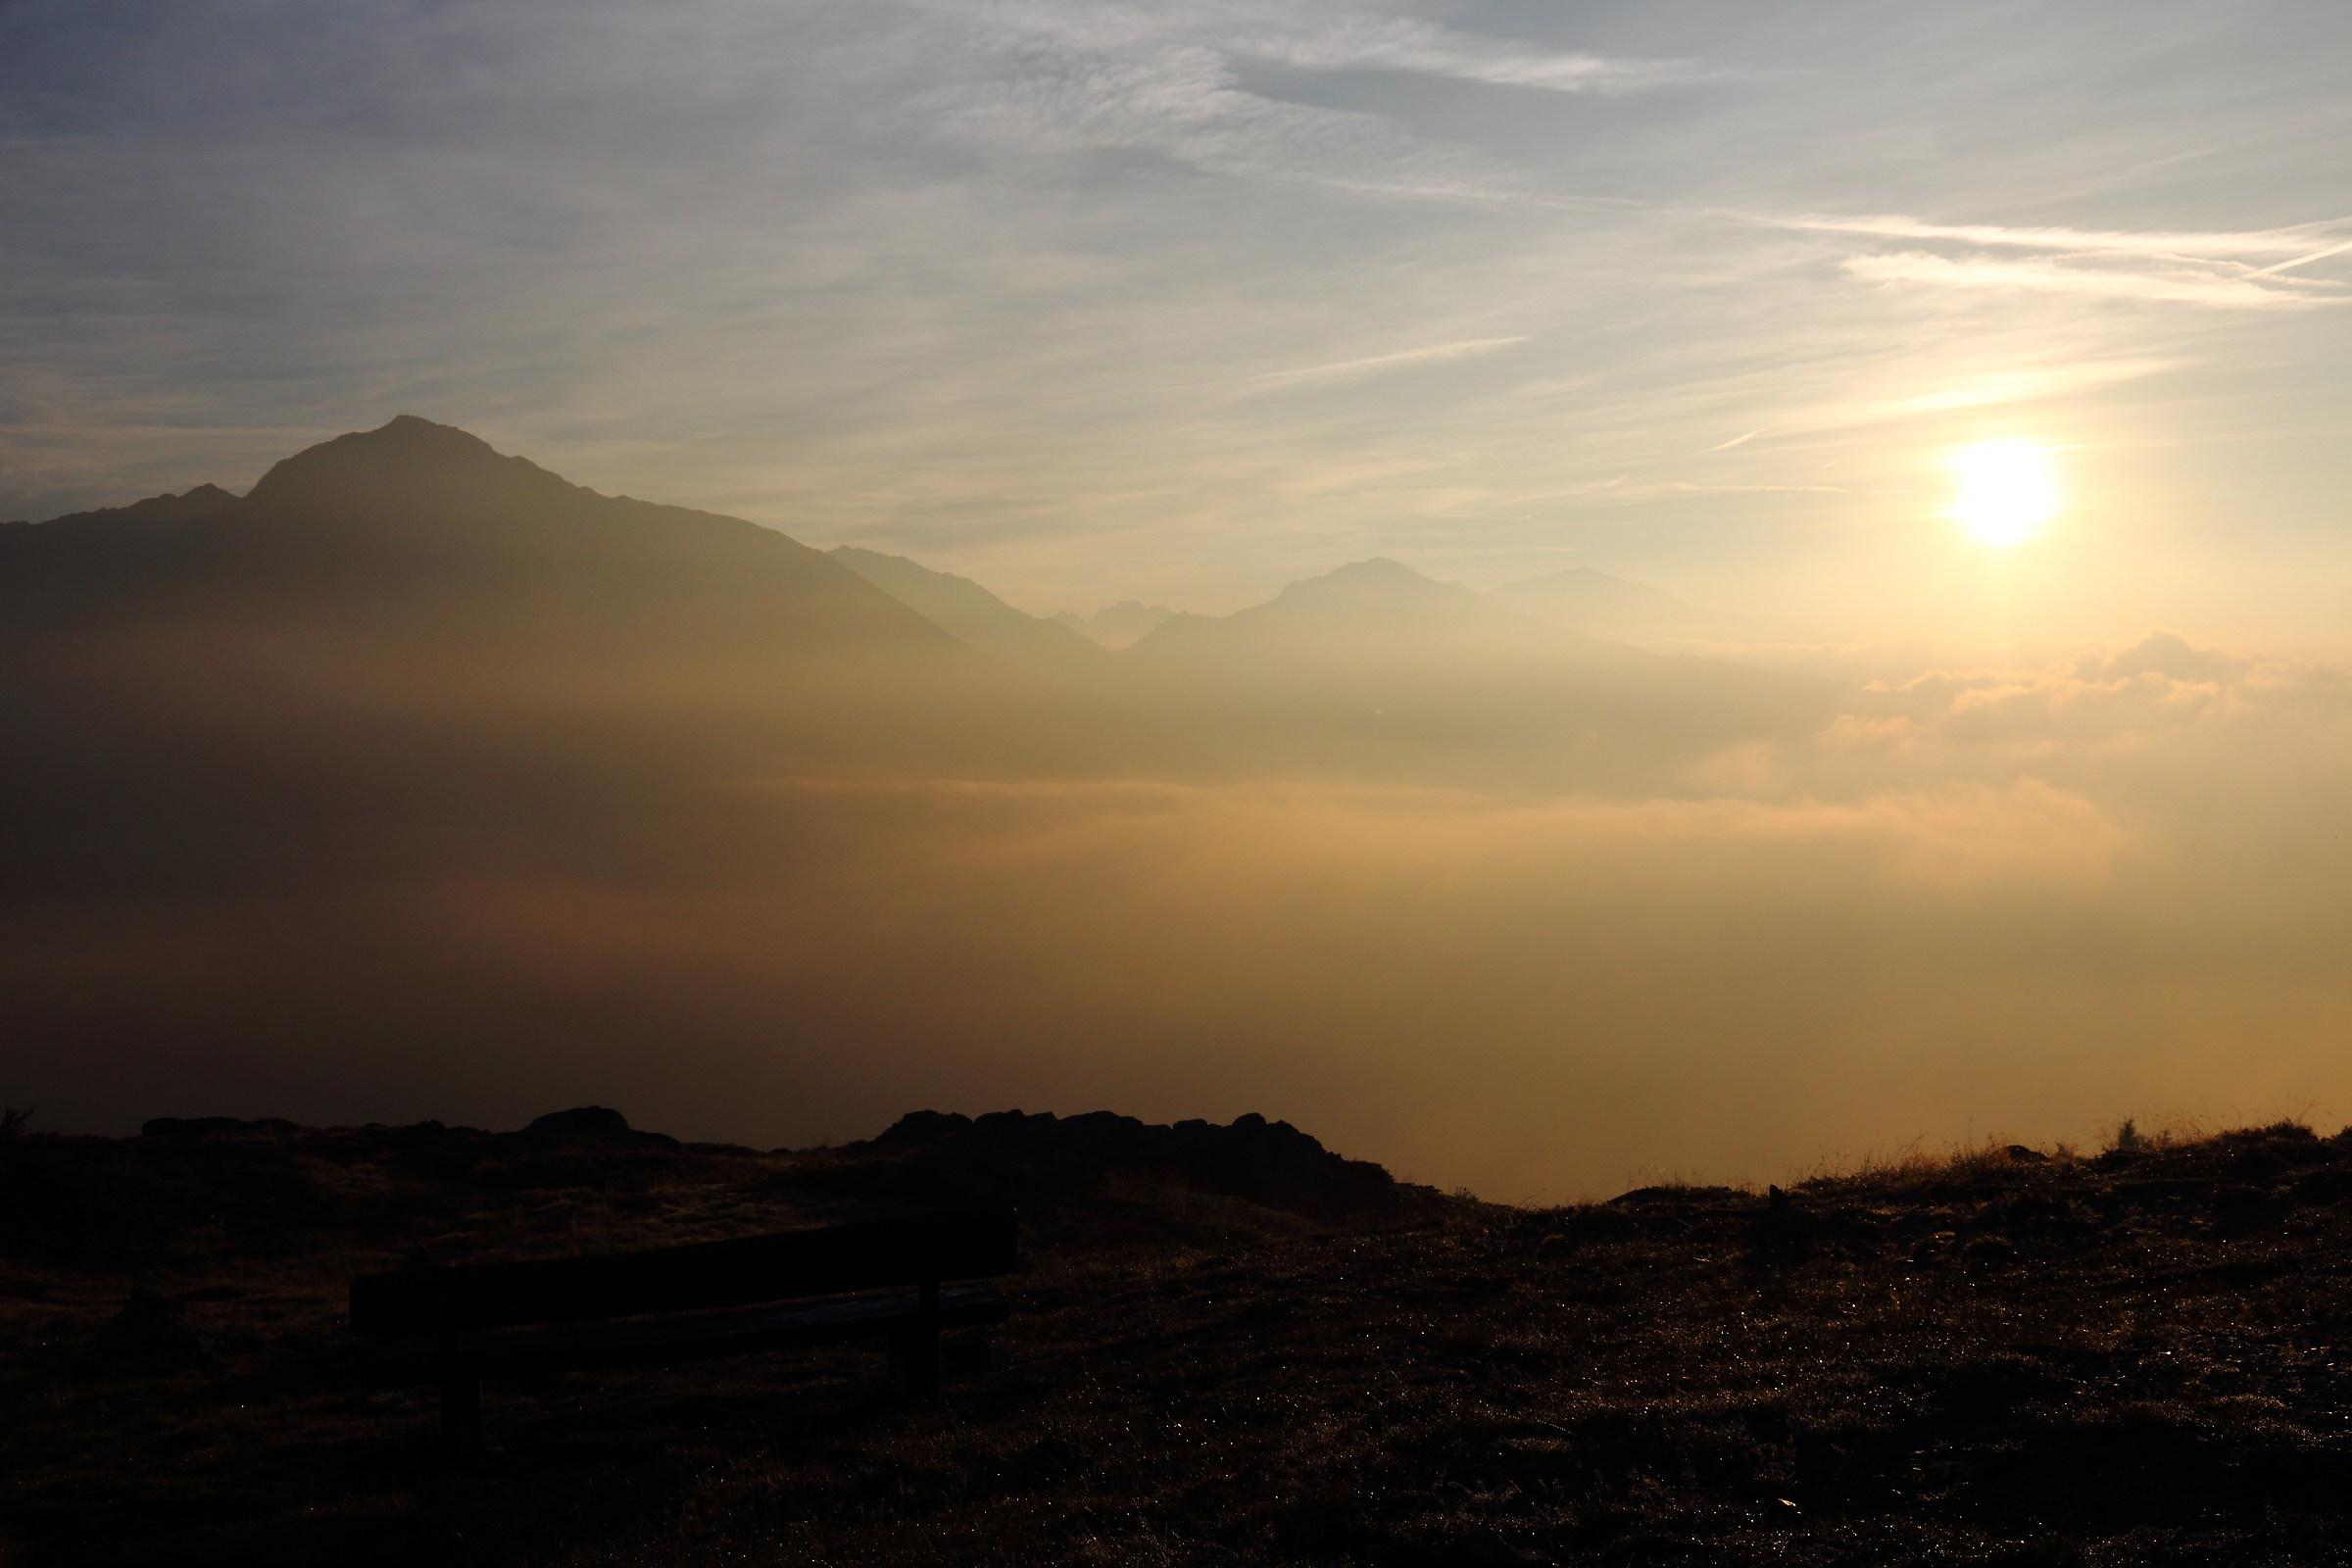 Dawn on Steiner Mandl - Vals - South Tyrol...